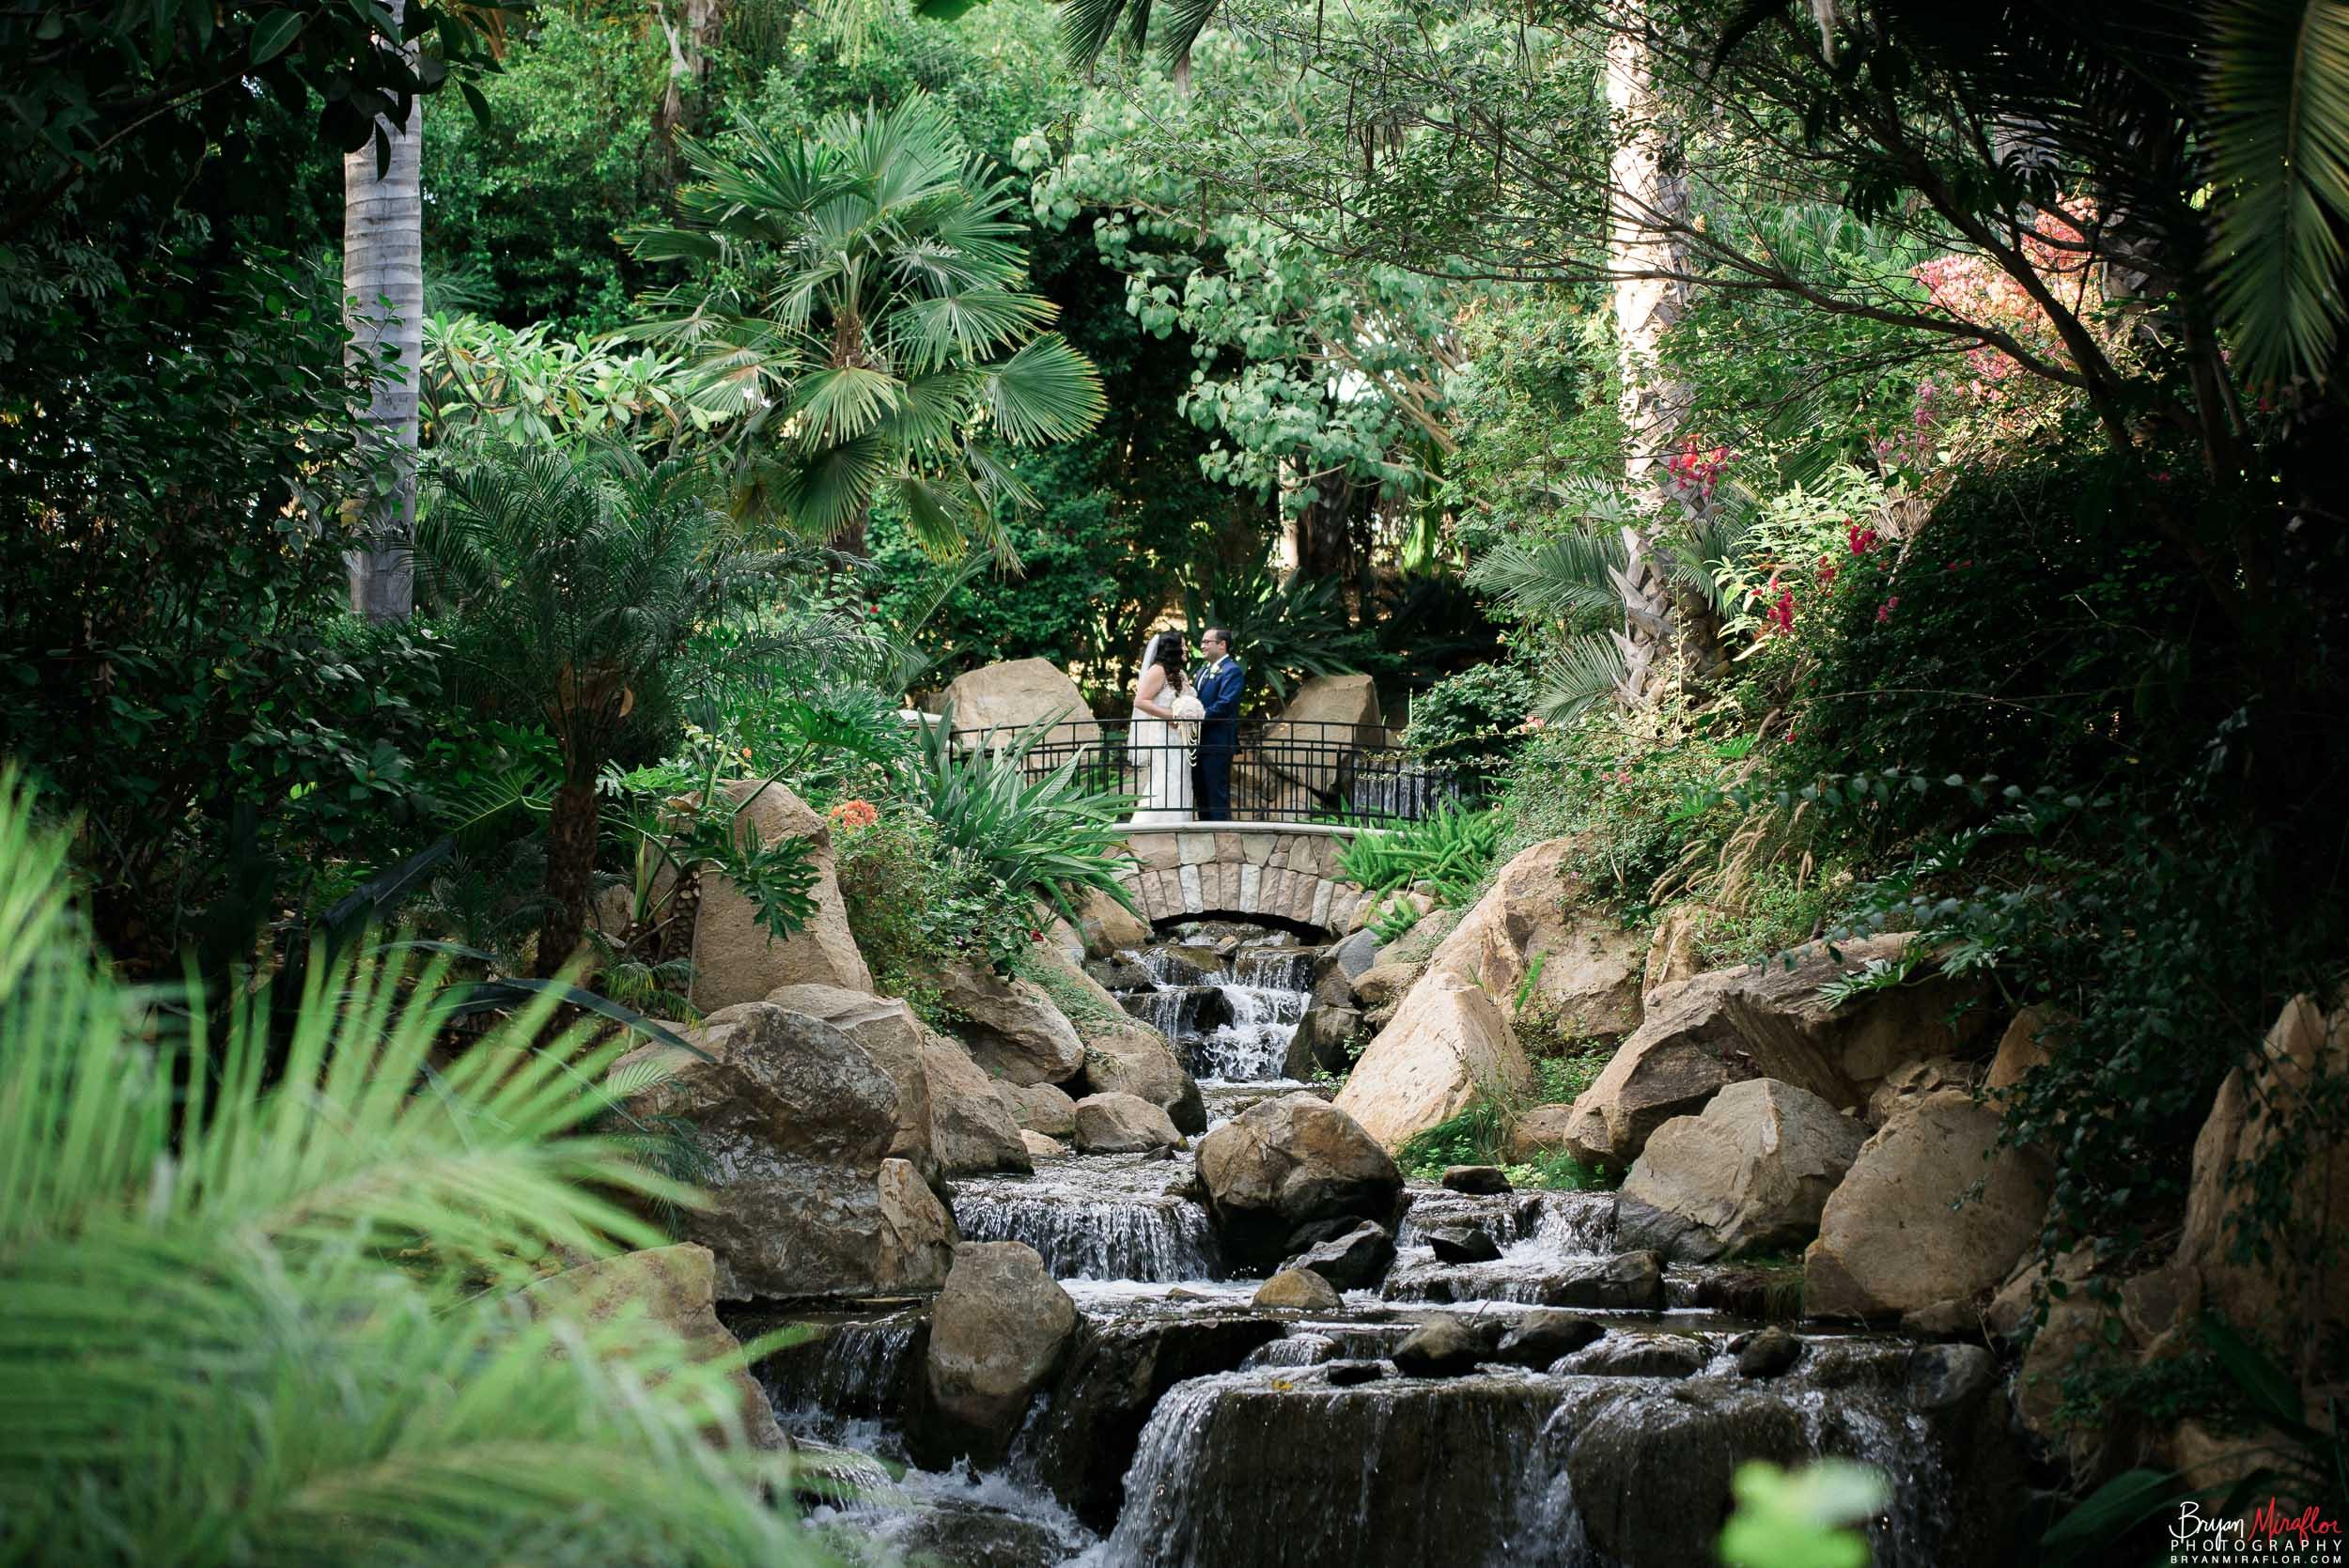 Bryan-Miraflor-Photography-Hannah-Jonathan-Married-Grand-Traditions-Estate-Gardens-Fallbrook-20171222-004.jpg